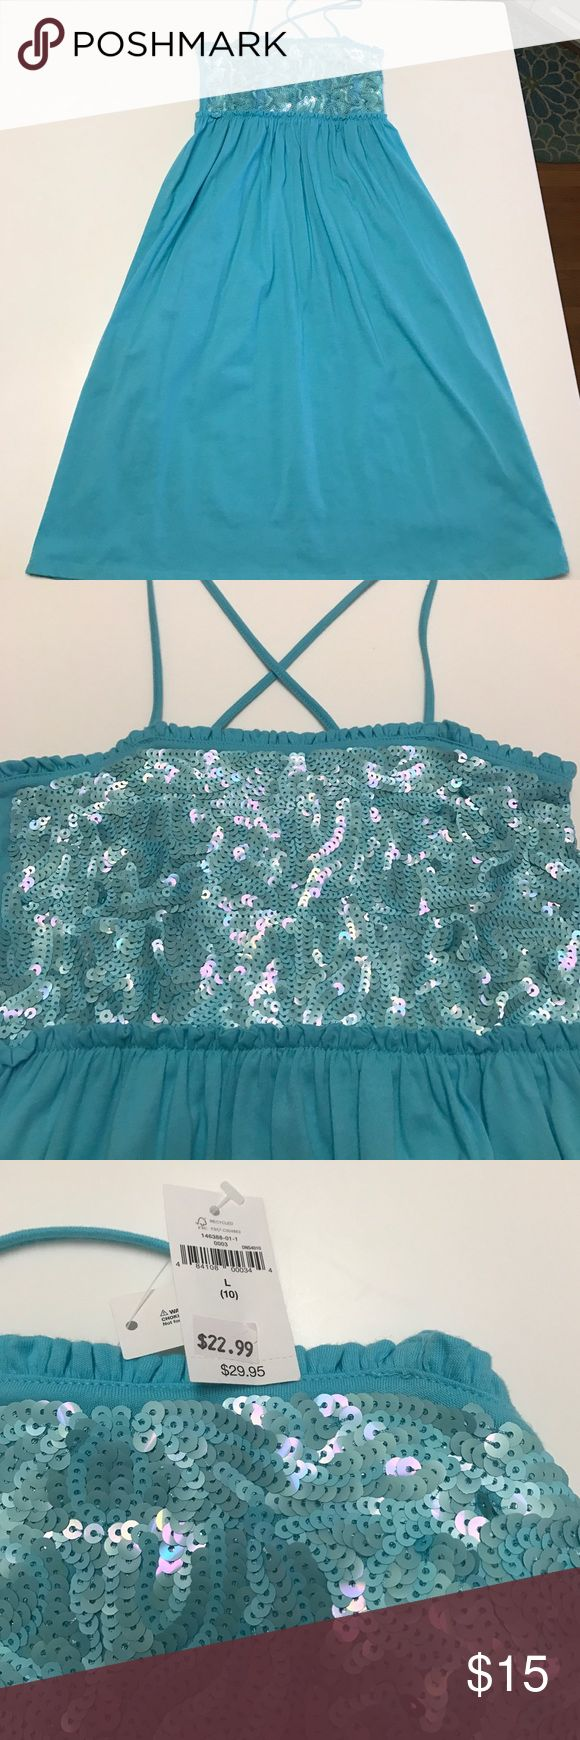 New Gap Kids maxi dress Maxi dress by gap kids with sequin top.   Super cute!! Gap Kids Dresses Casual